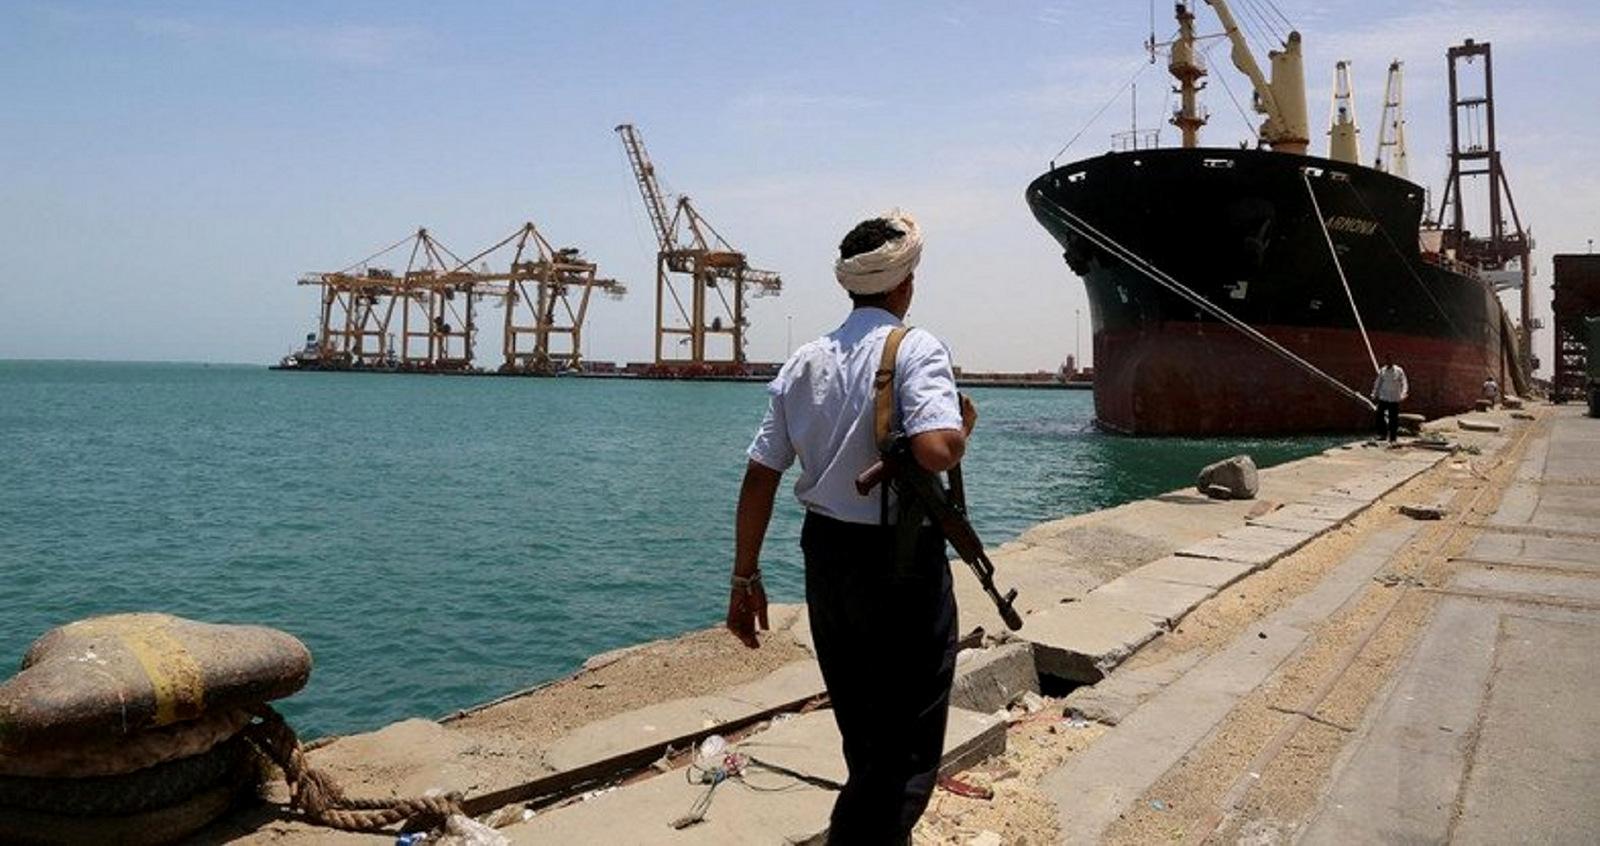 Il porto della città yemenita Hodeidah